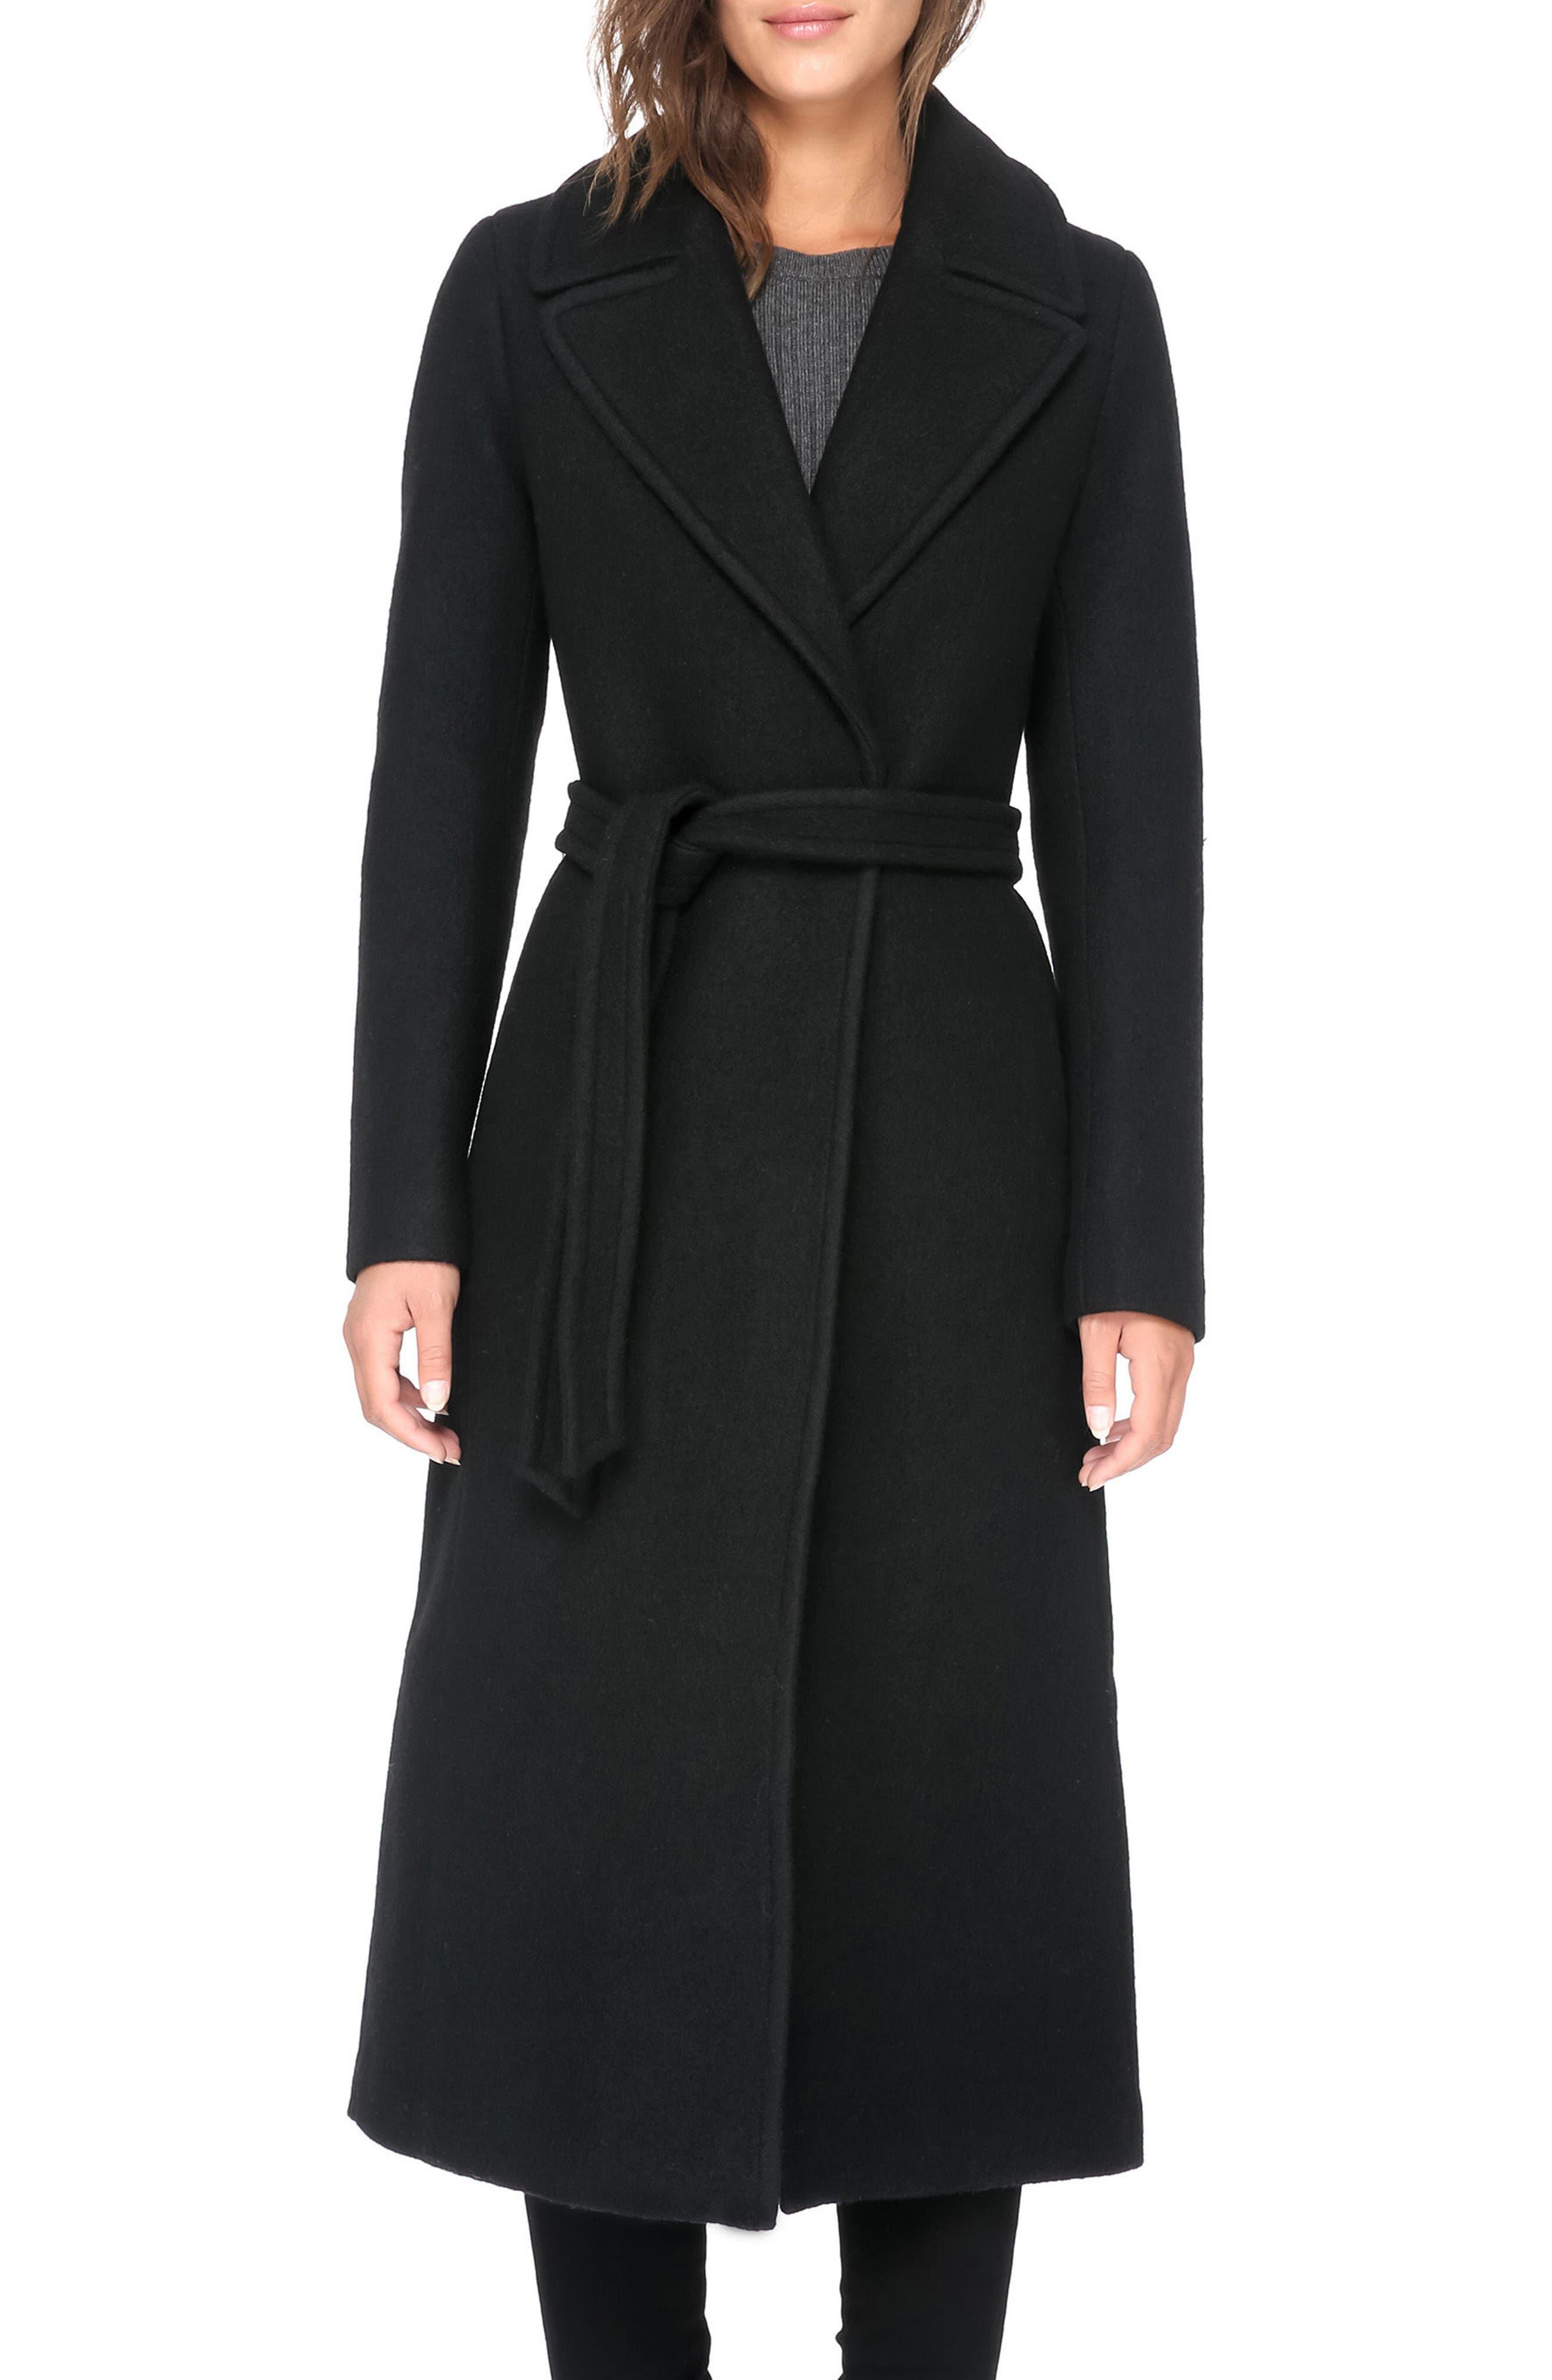 Belted Boiled Wool Coat,                         Main,                         color, Black